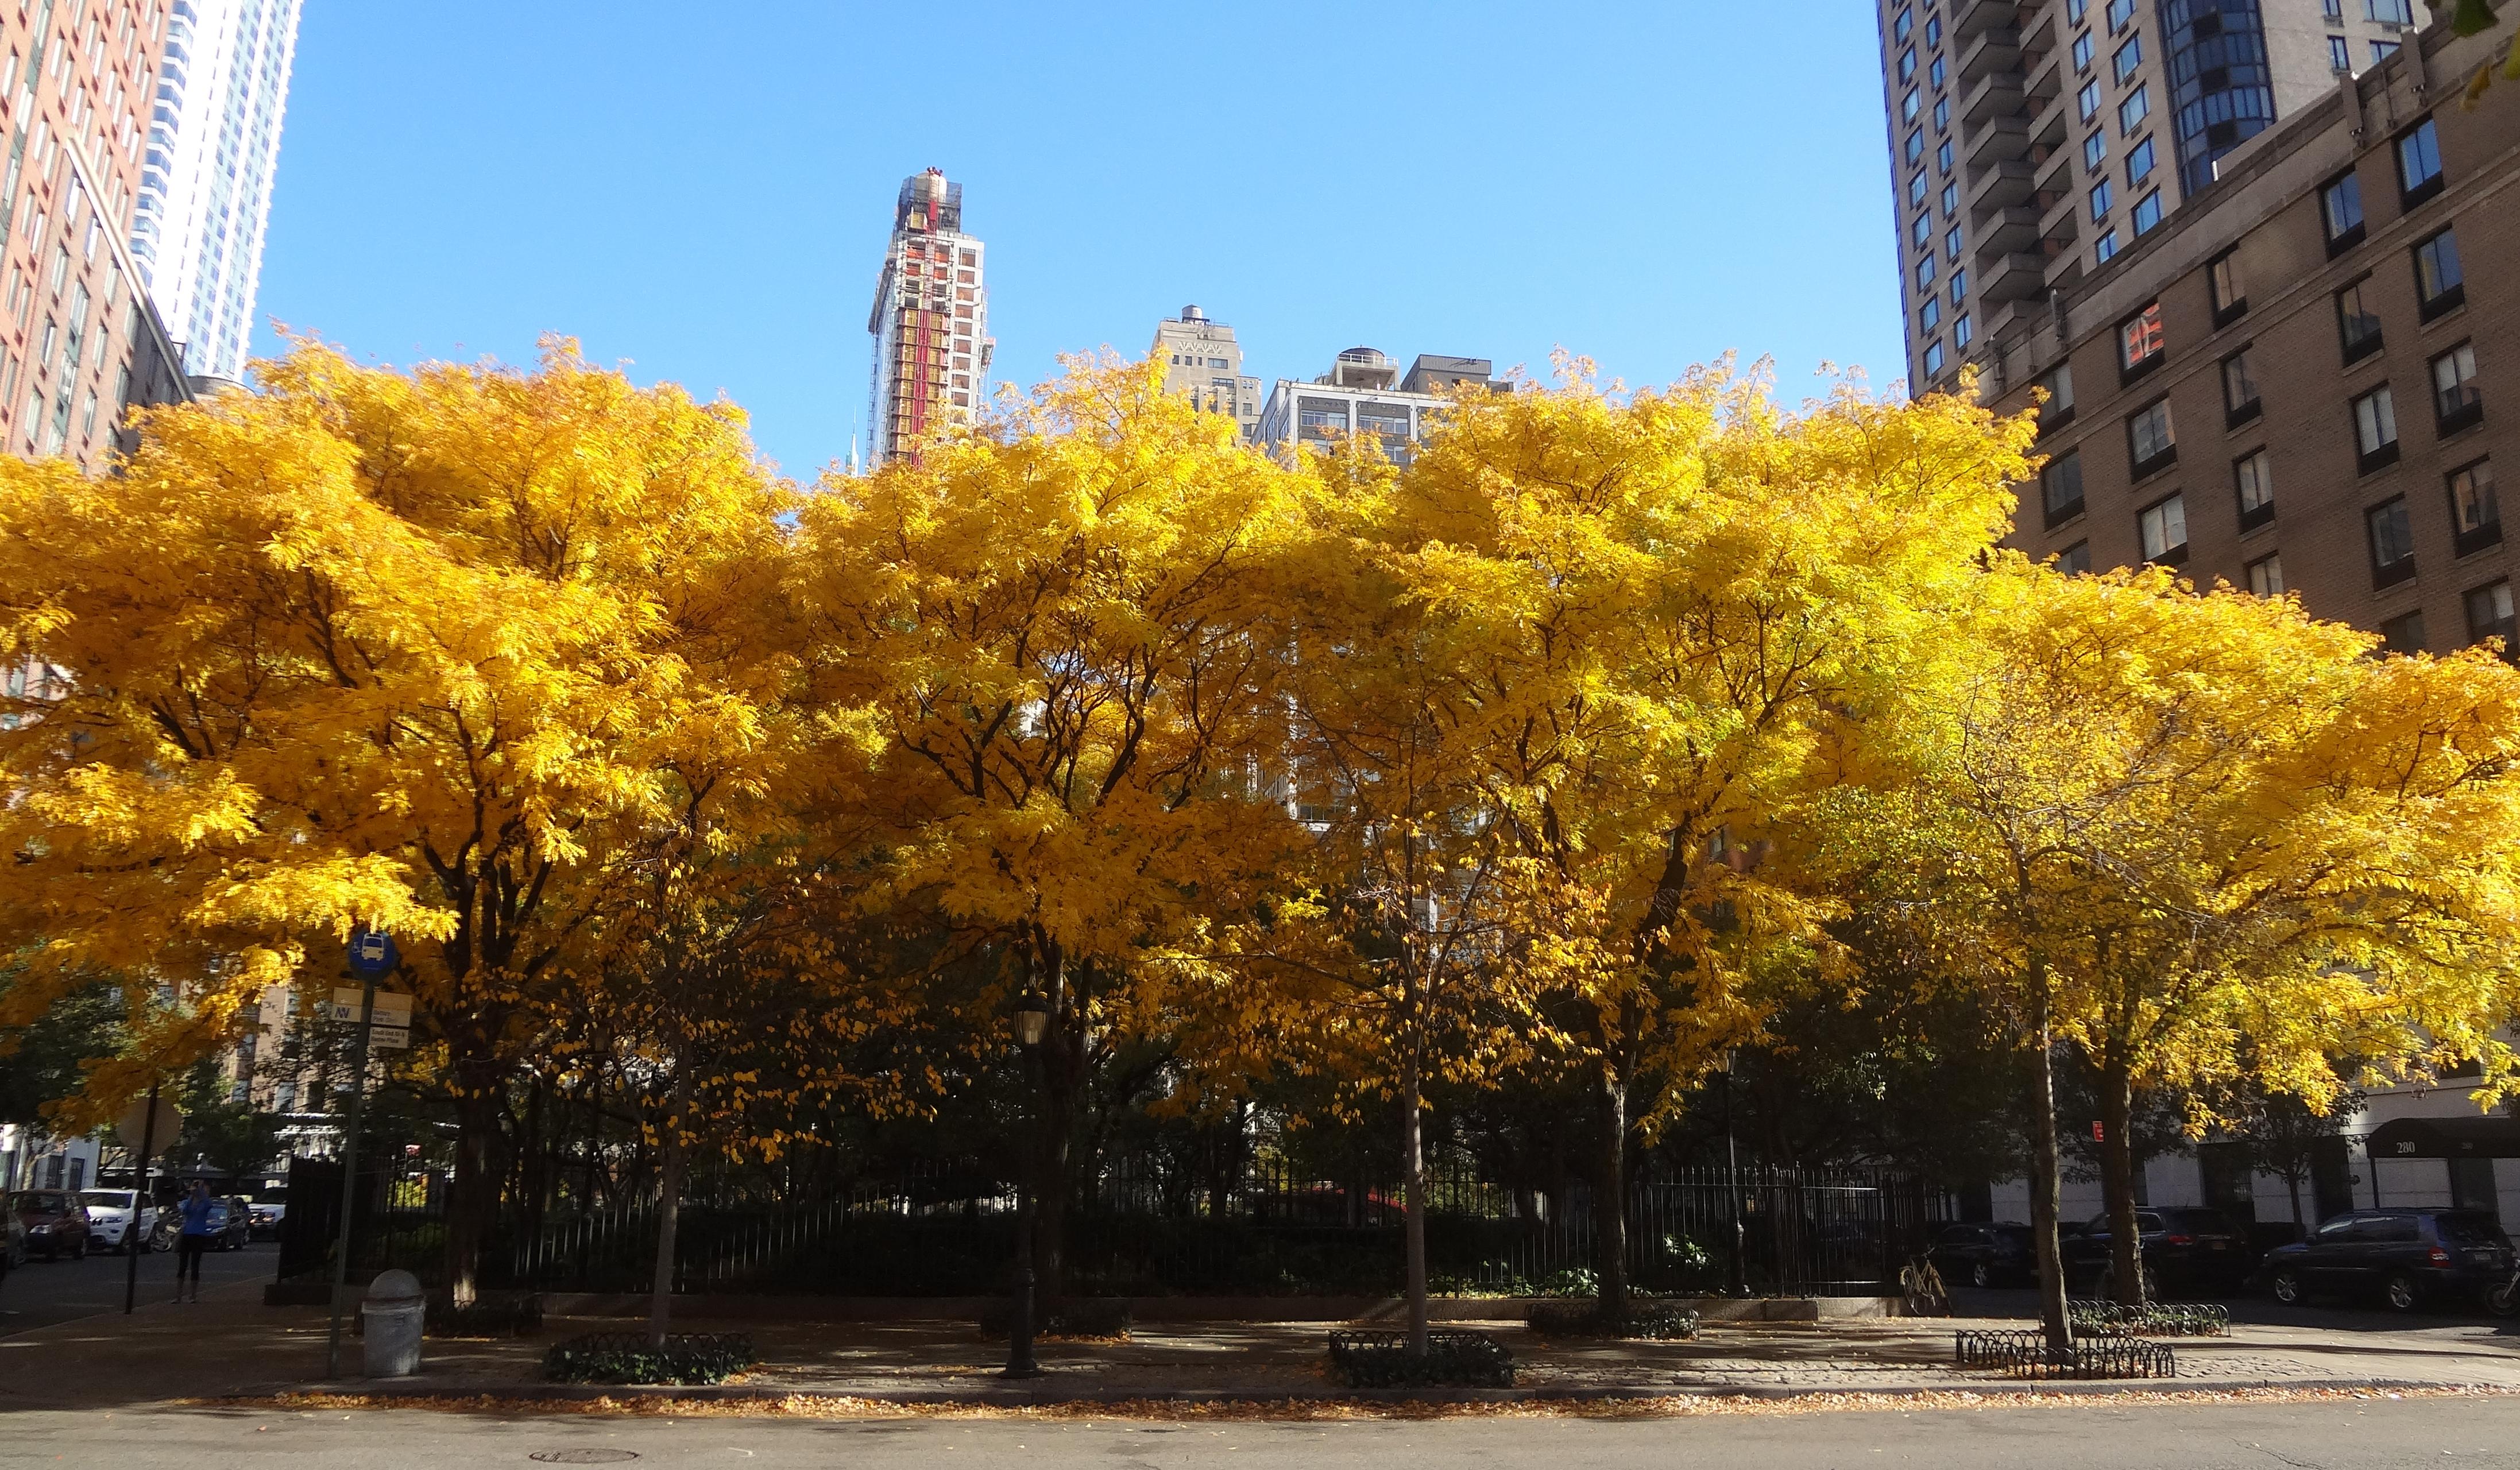 Rector yellow trees